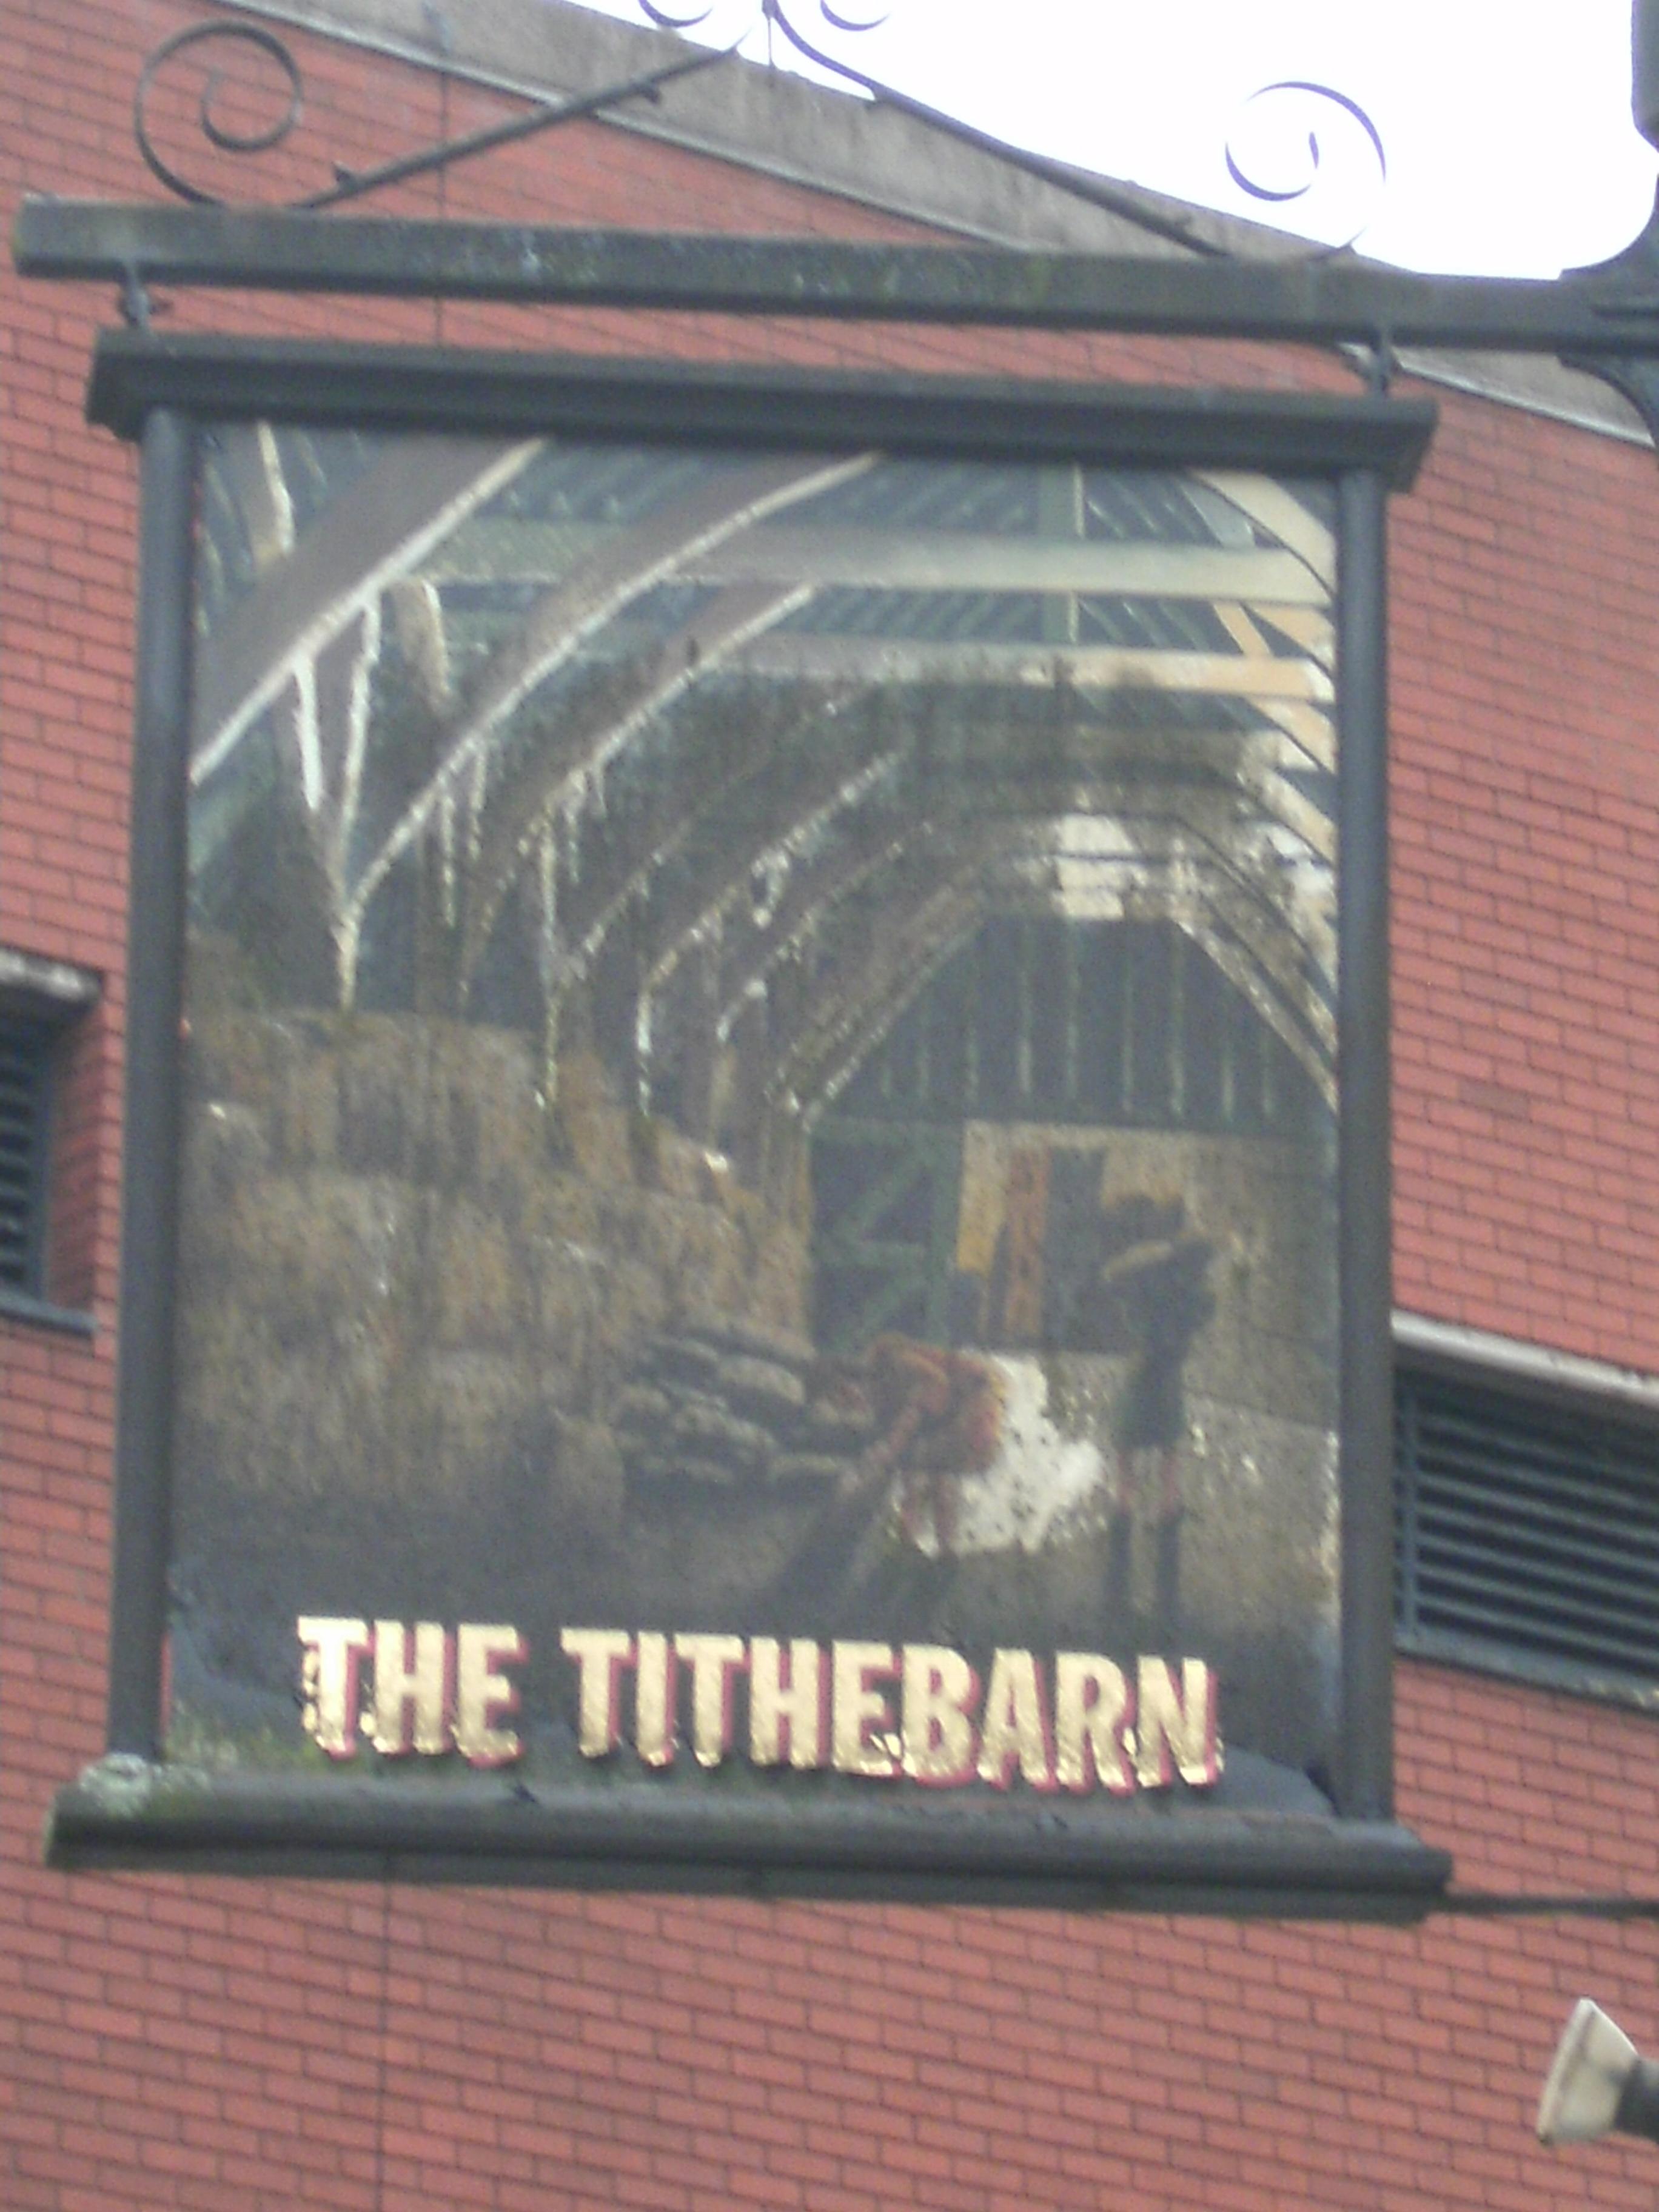 Photo taken by me – Preston pub sign – The Tithebarn